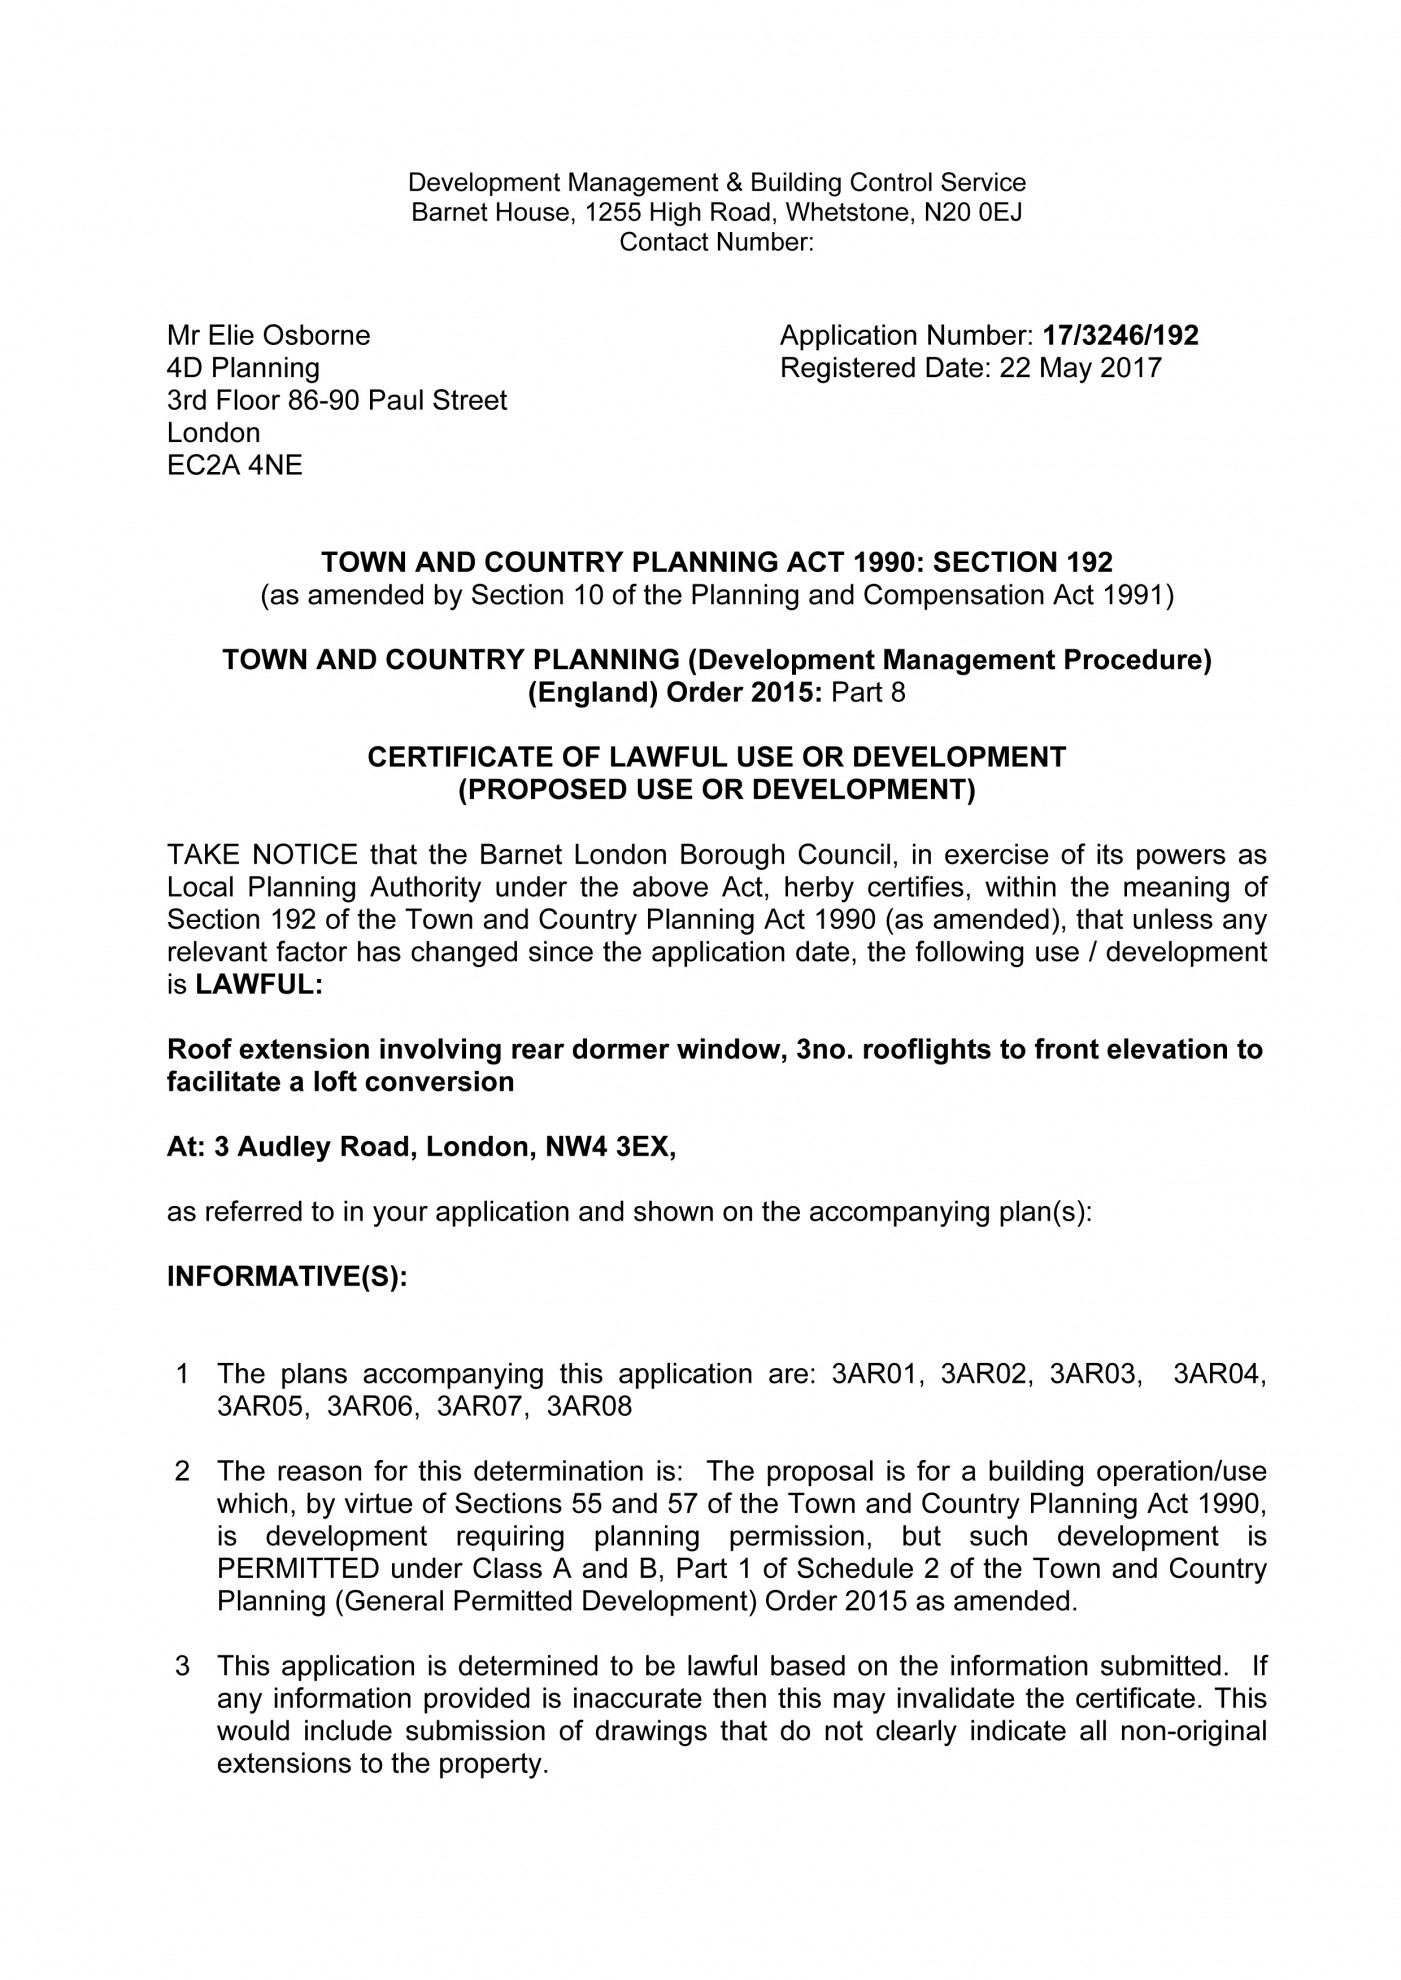 decision notice - Barnet - lawful development certificate for loft conversion